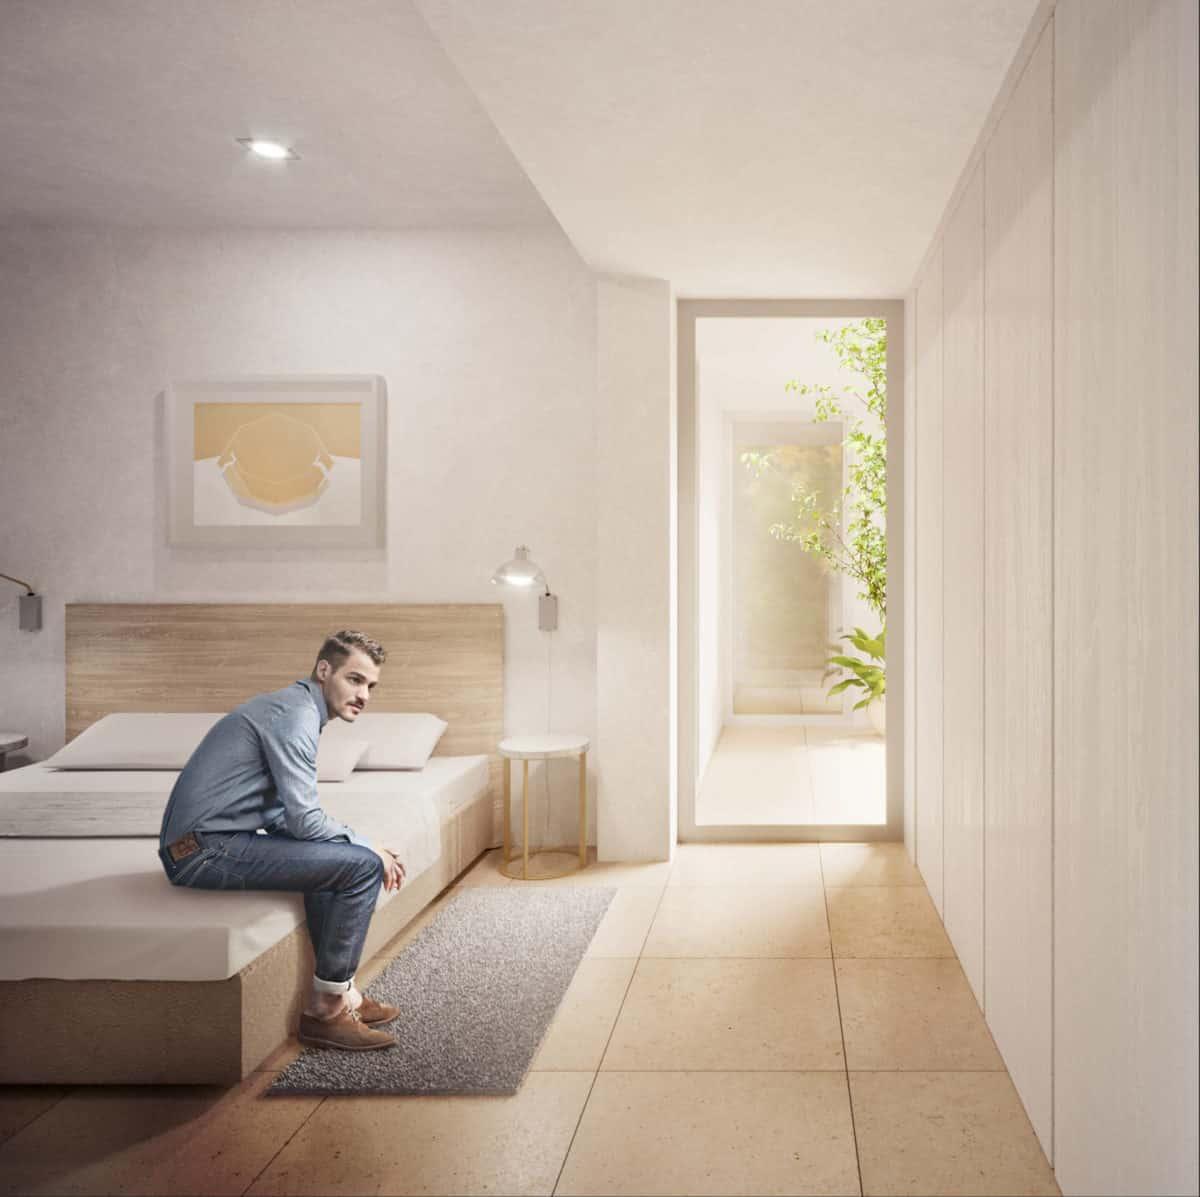 OCNOS_Vista interior dormitorio